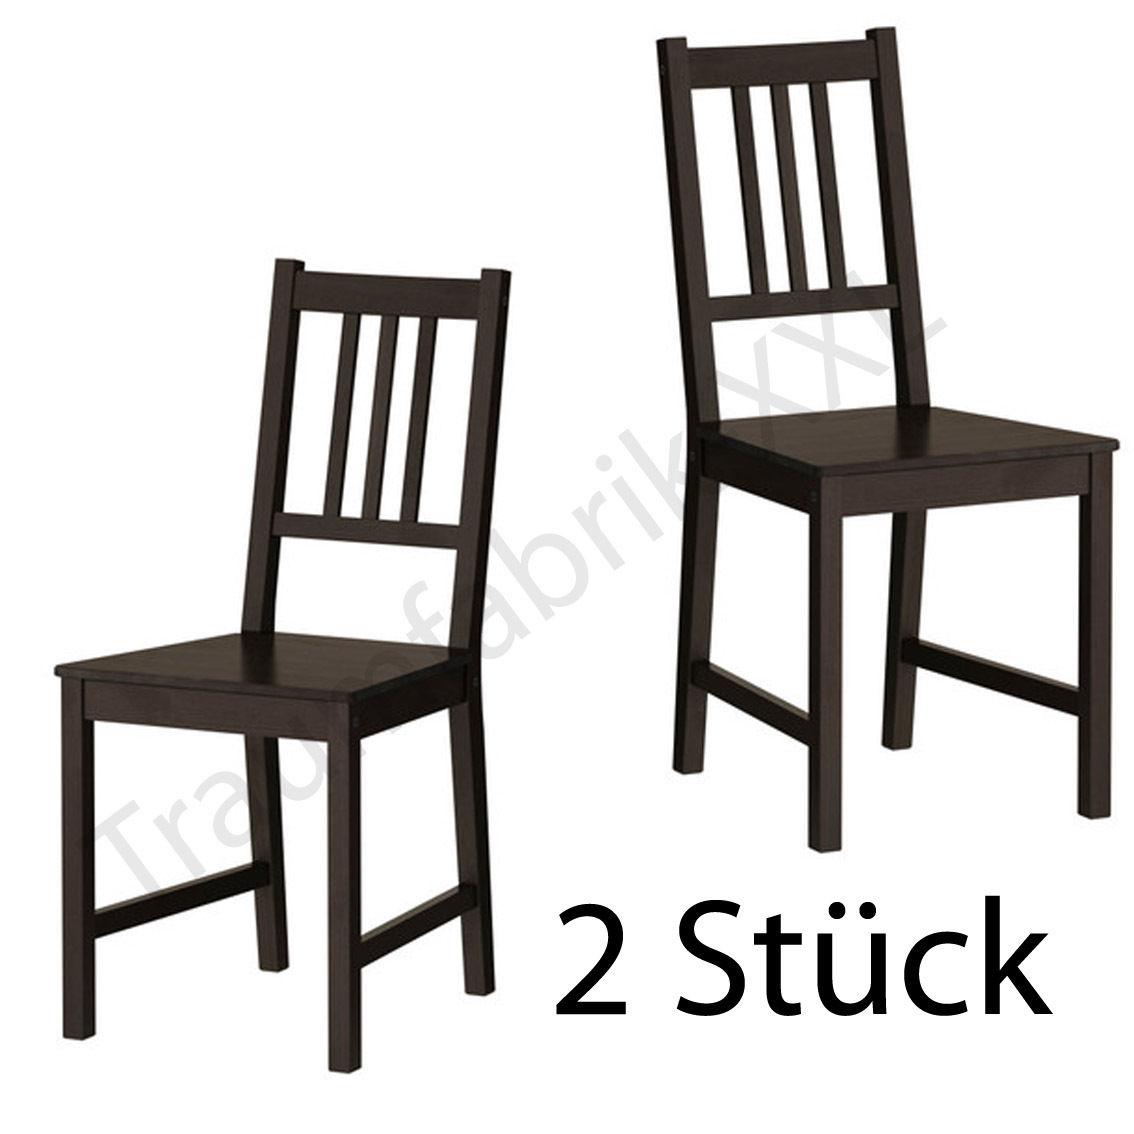 2xIKEA Küchenstuhl Stuhl Stühle Holzstuhl Kiefer ...